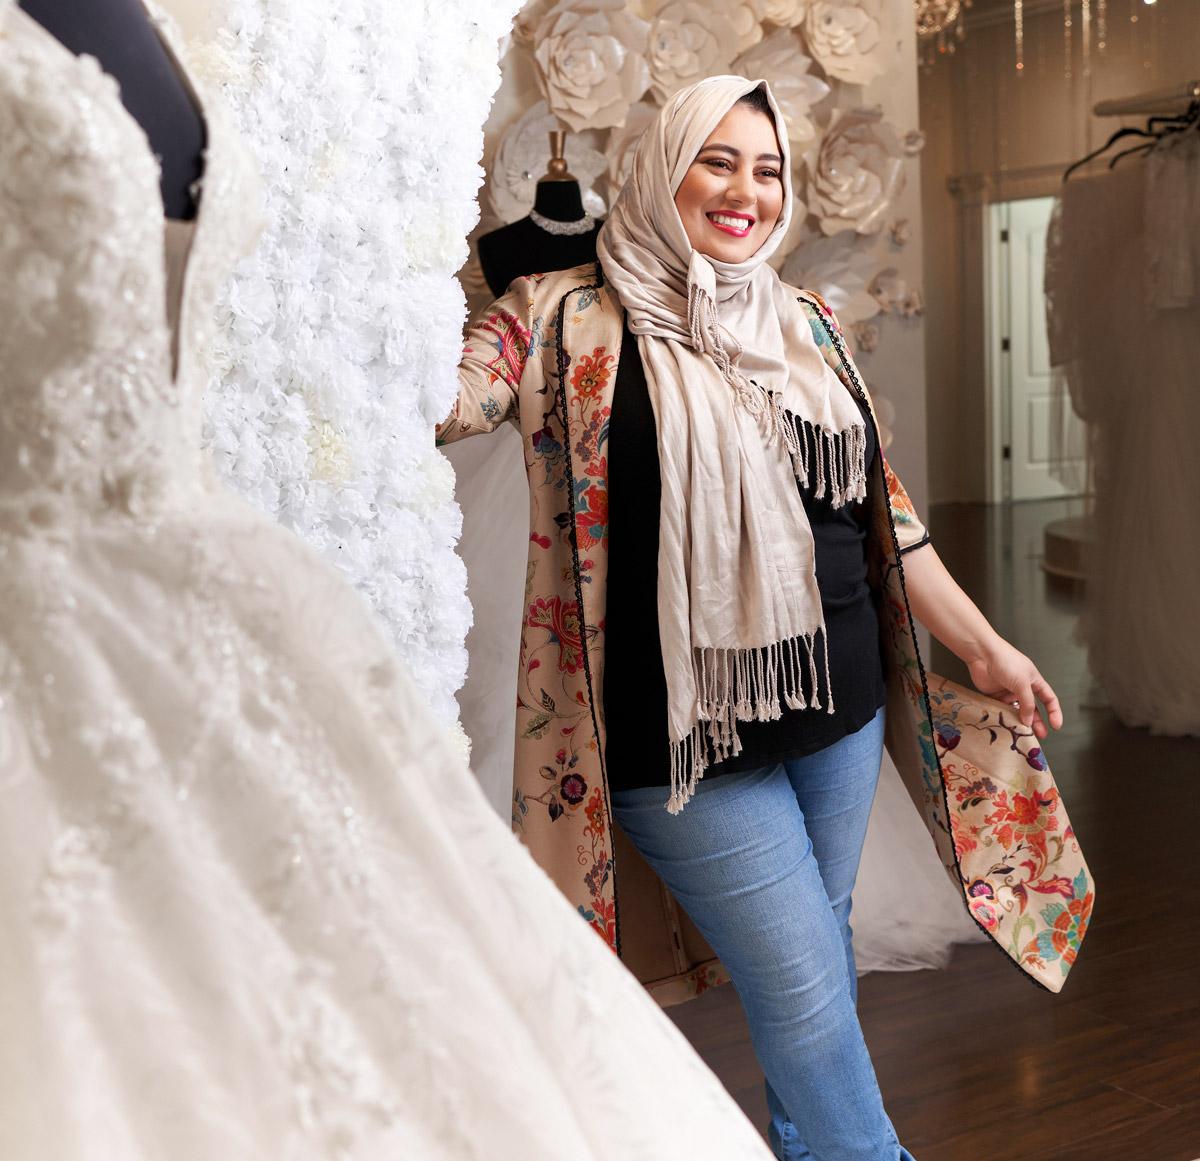 Rawan Asad standing next to a wedding gown